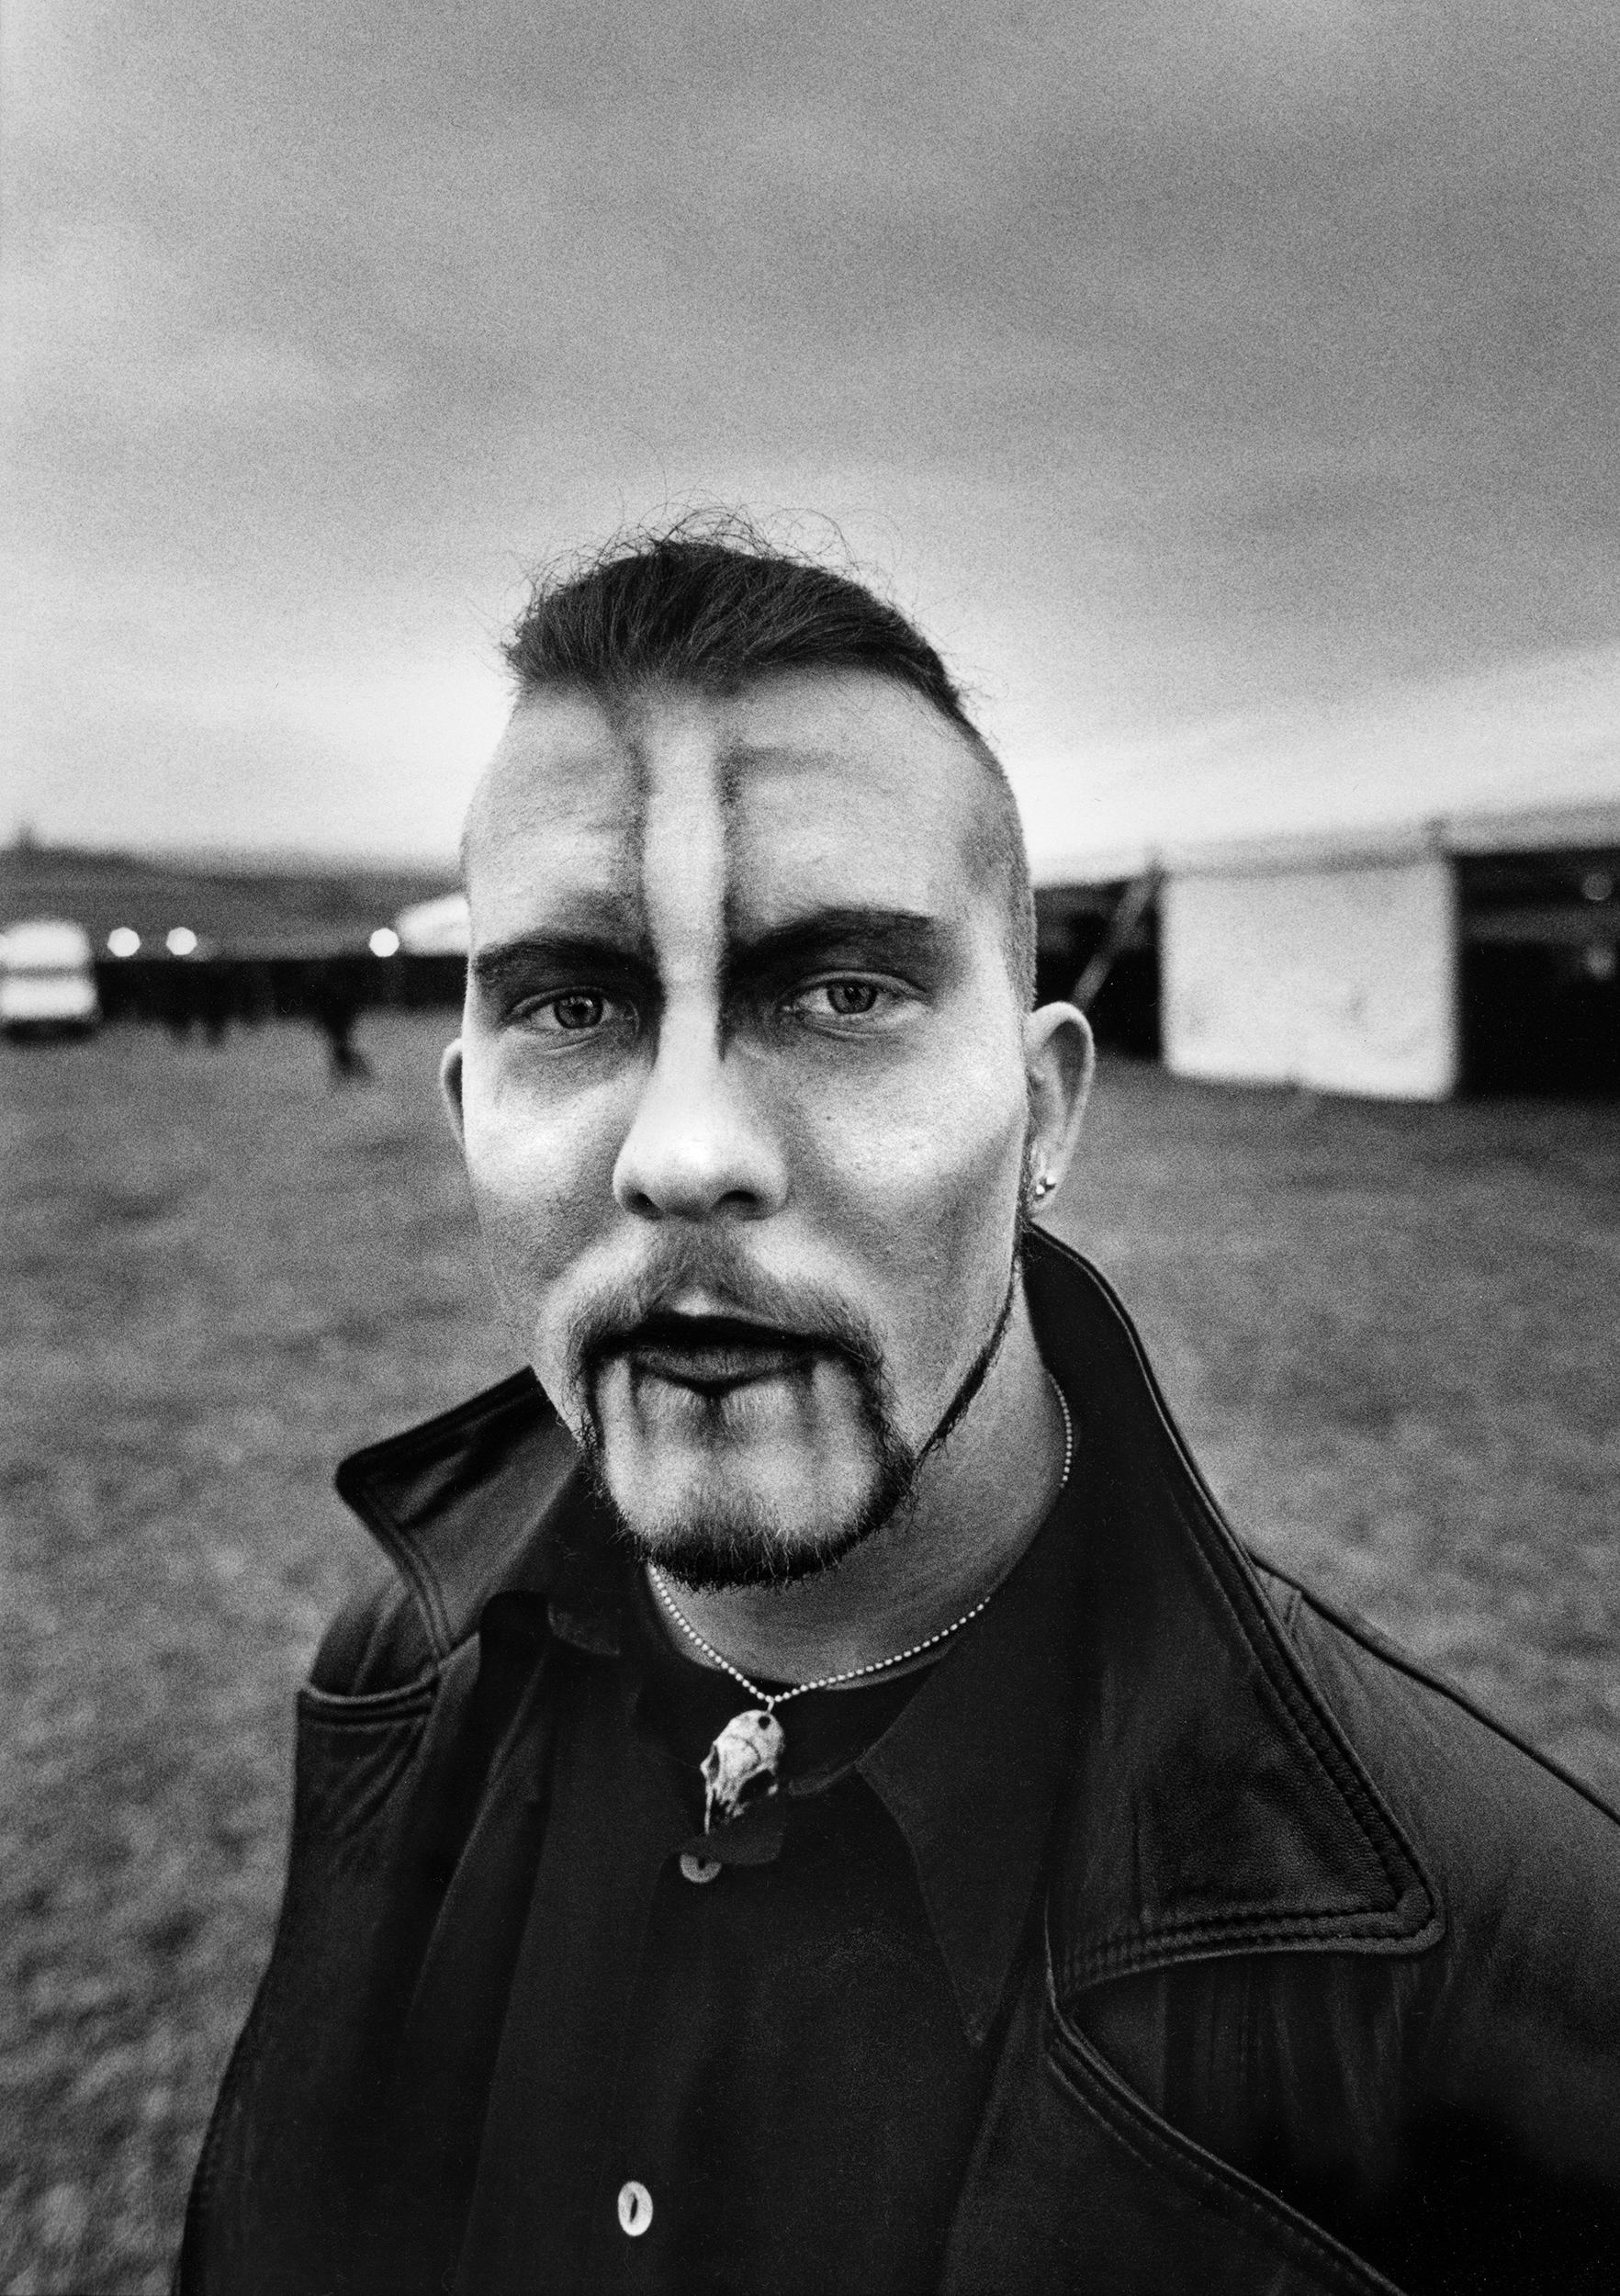 Simon at Dracfest, Whitby 1997.